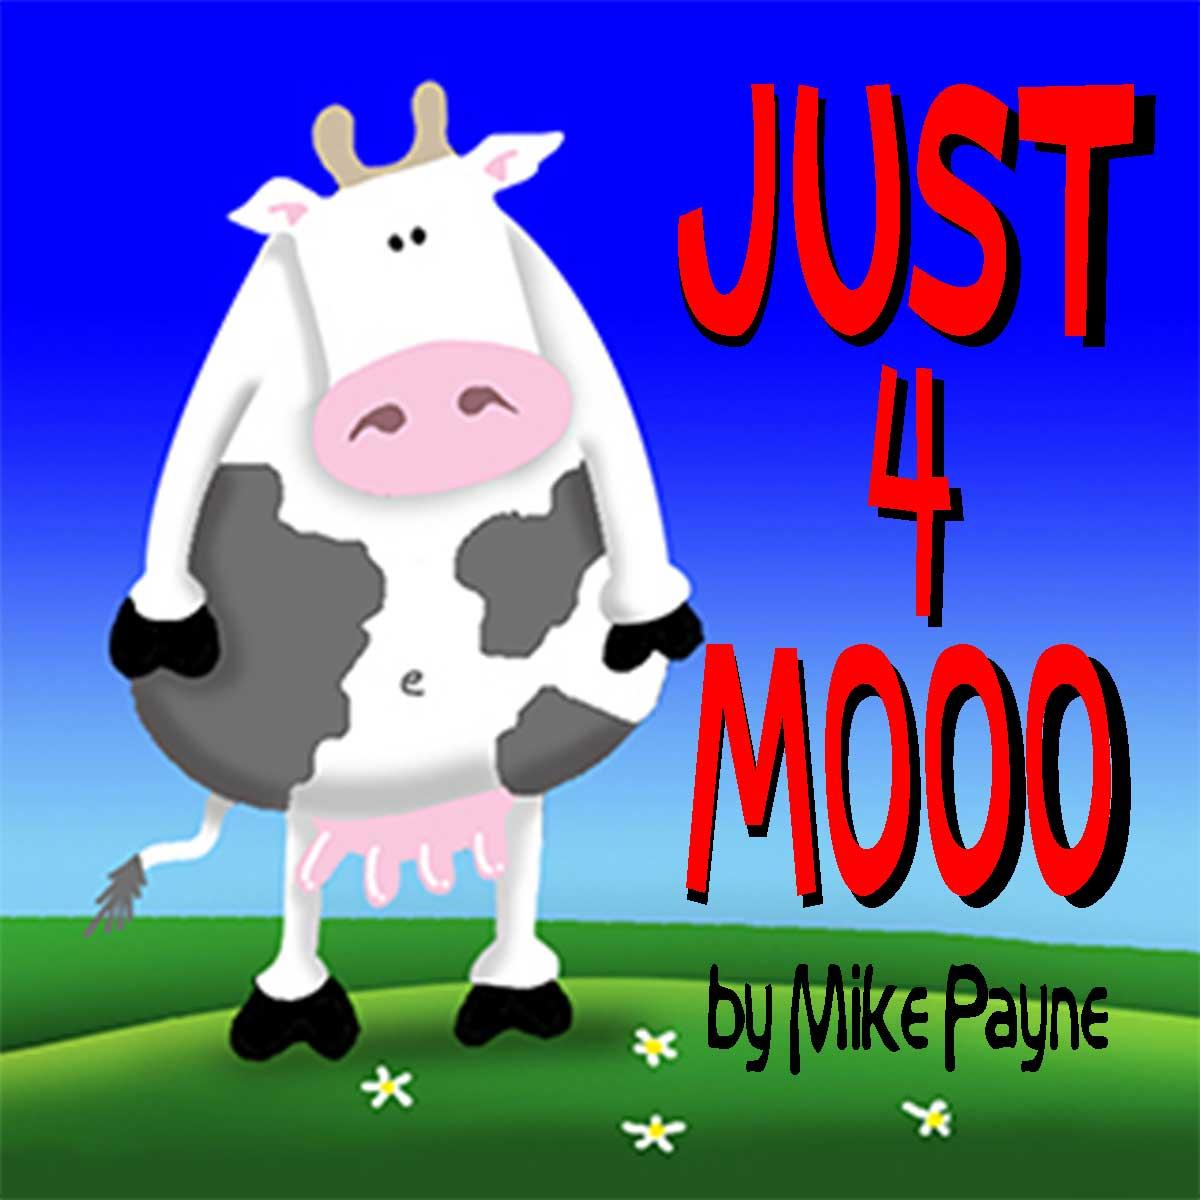 Just 4 Mooo